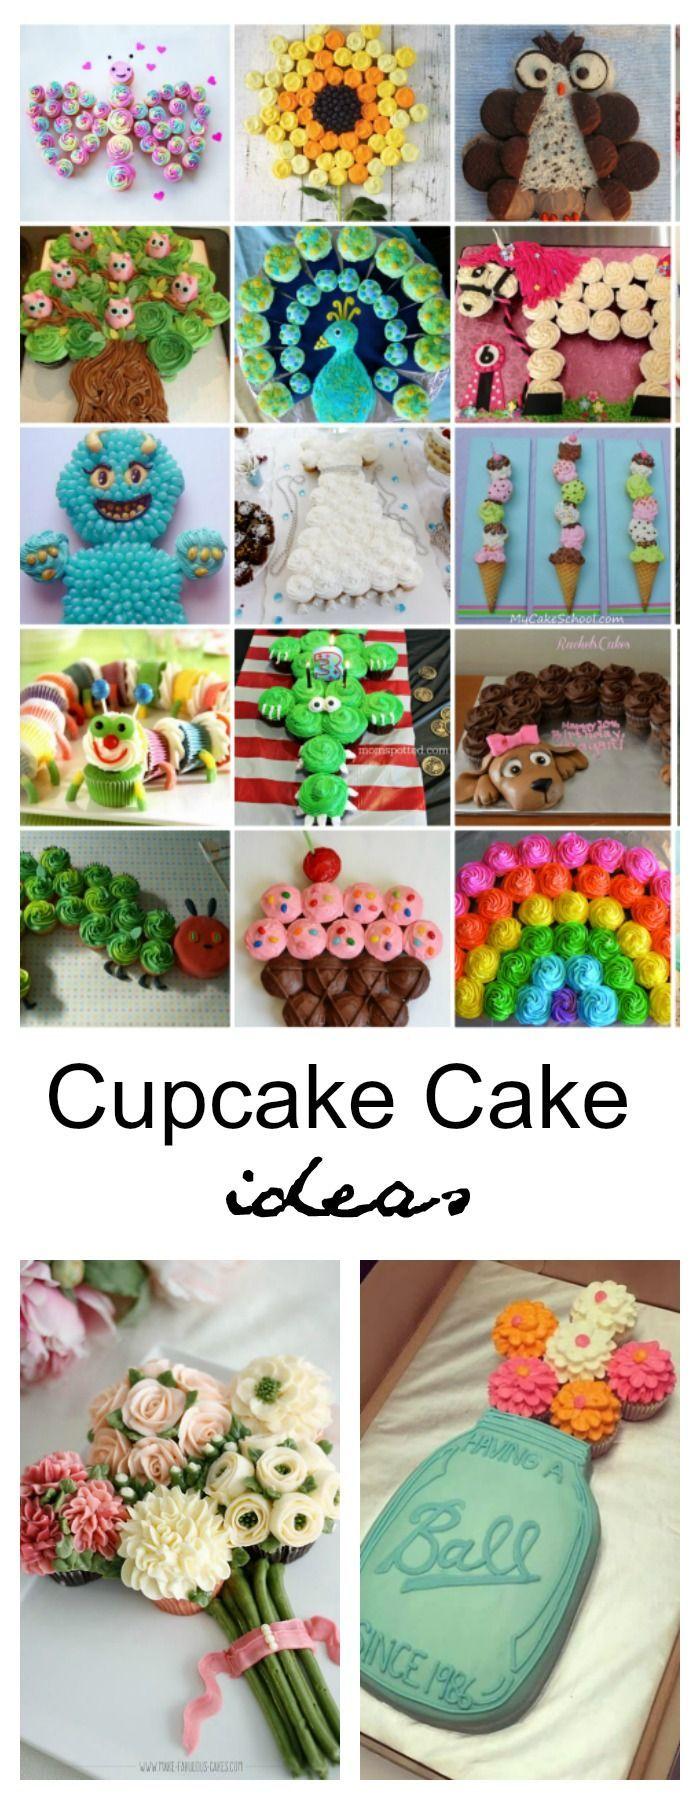 ... Cupcake Party on Pinterest | Cupcake Cakes, Cupcake Wars and Cupcake